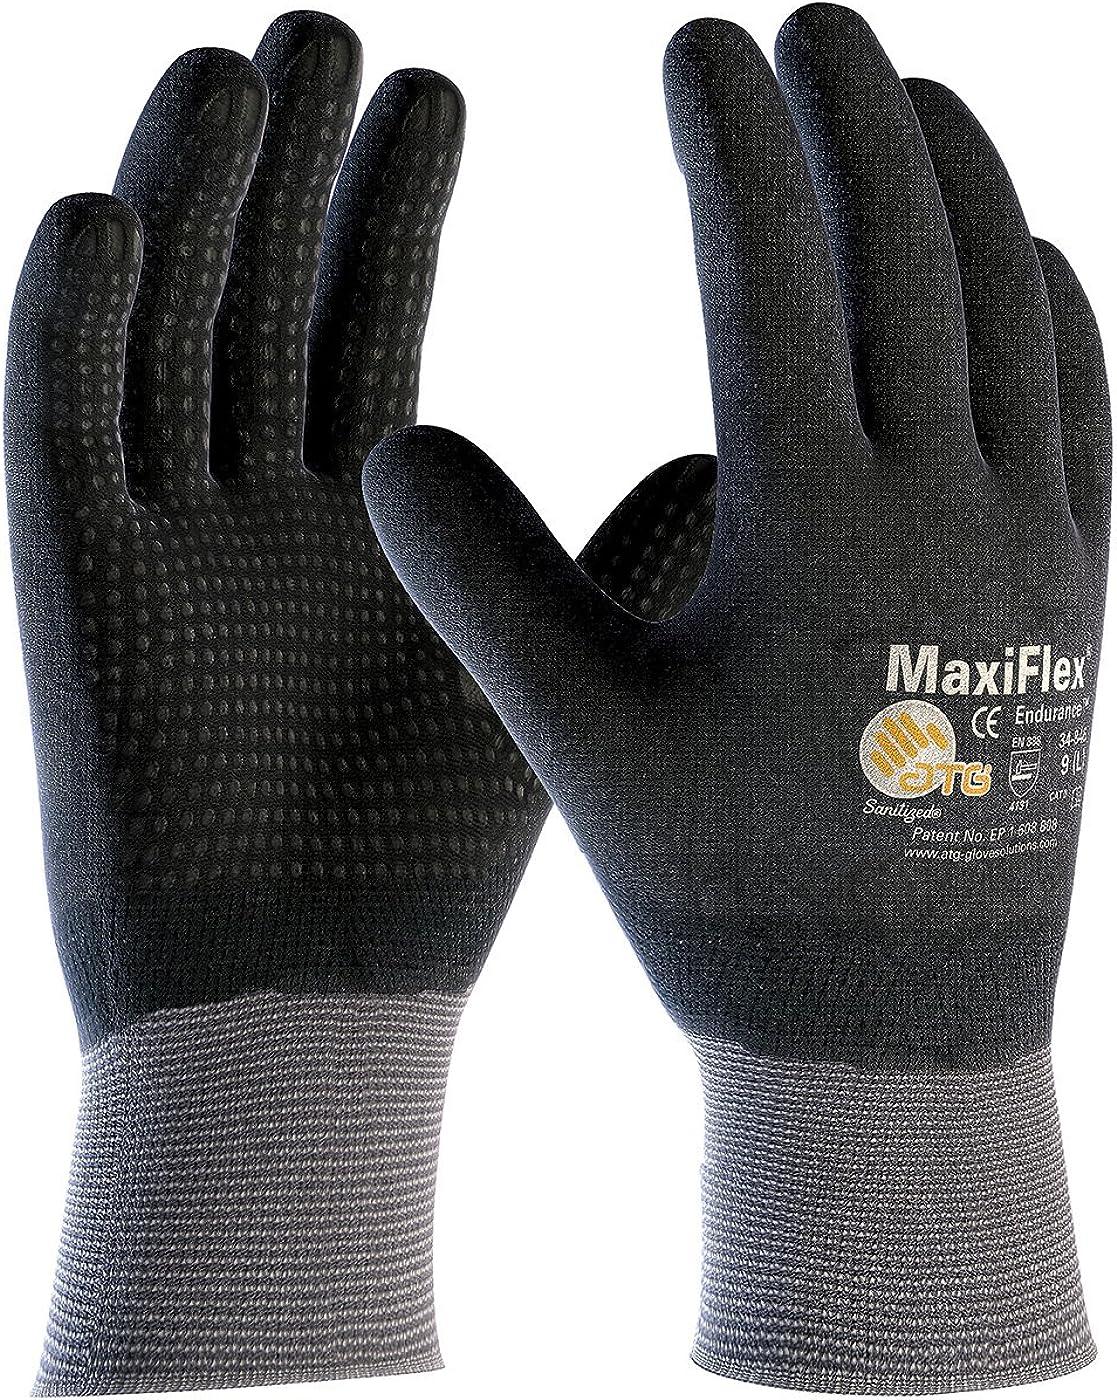 G-TEK Maxiflex Endurance 34-846 Seamless Knit Coated Gloves (Small)